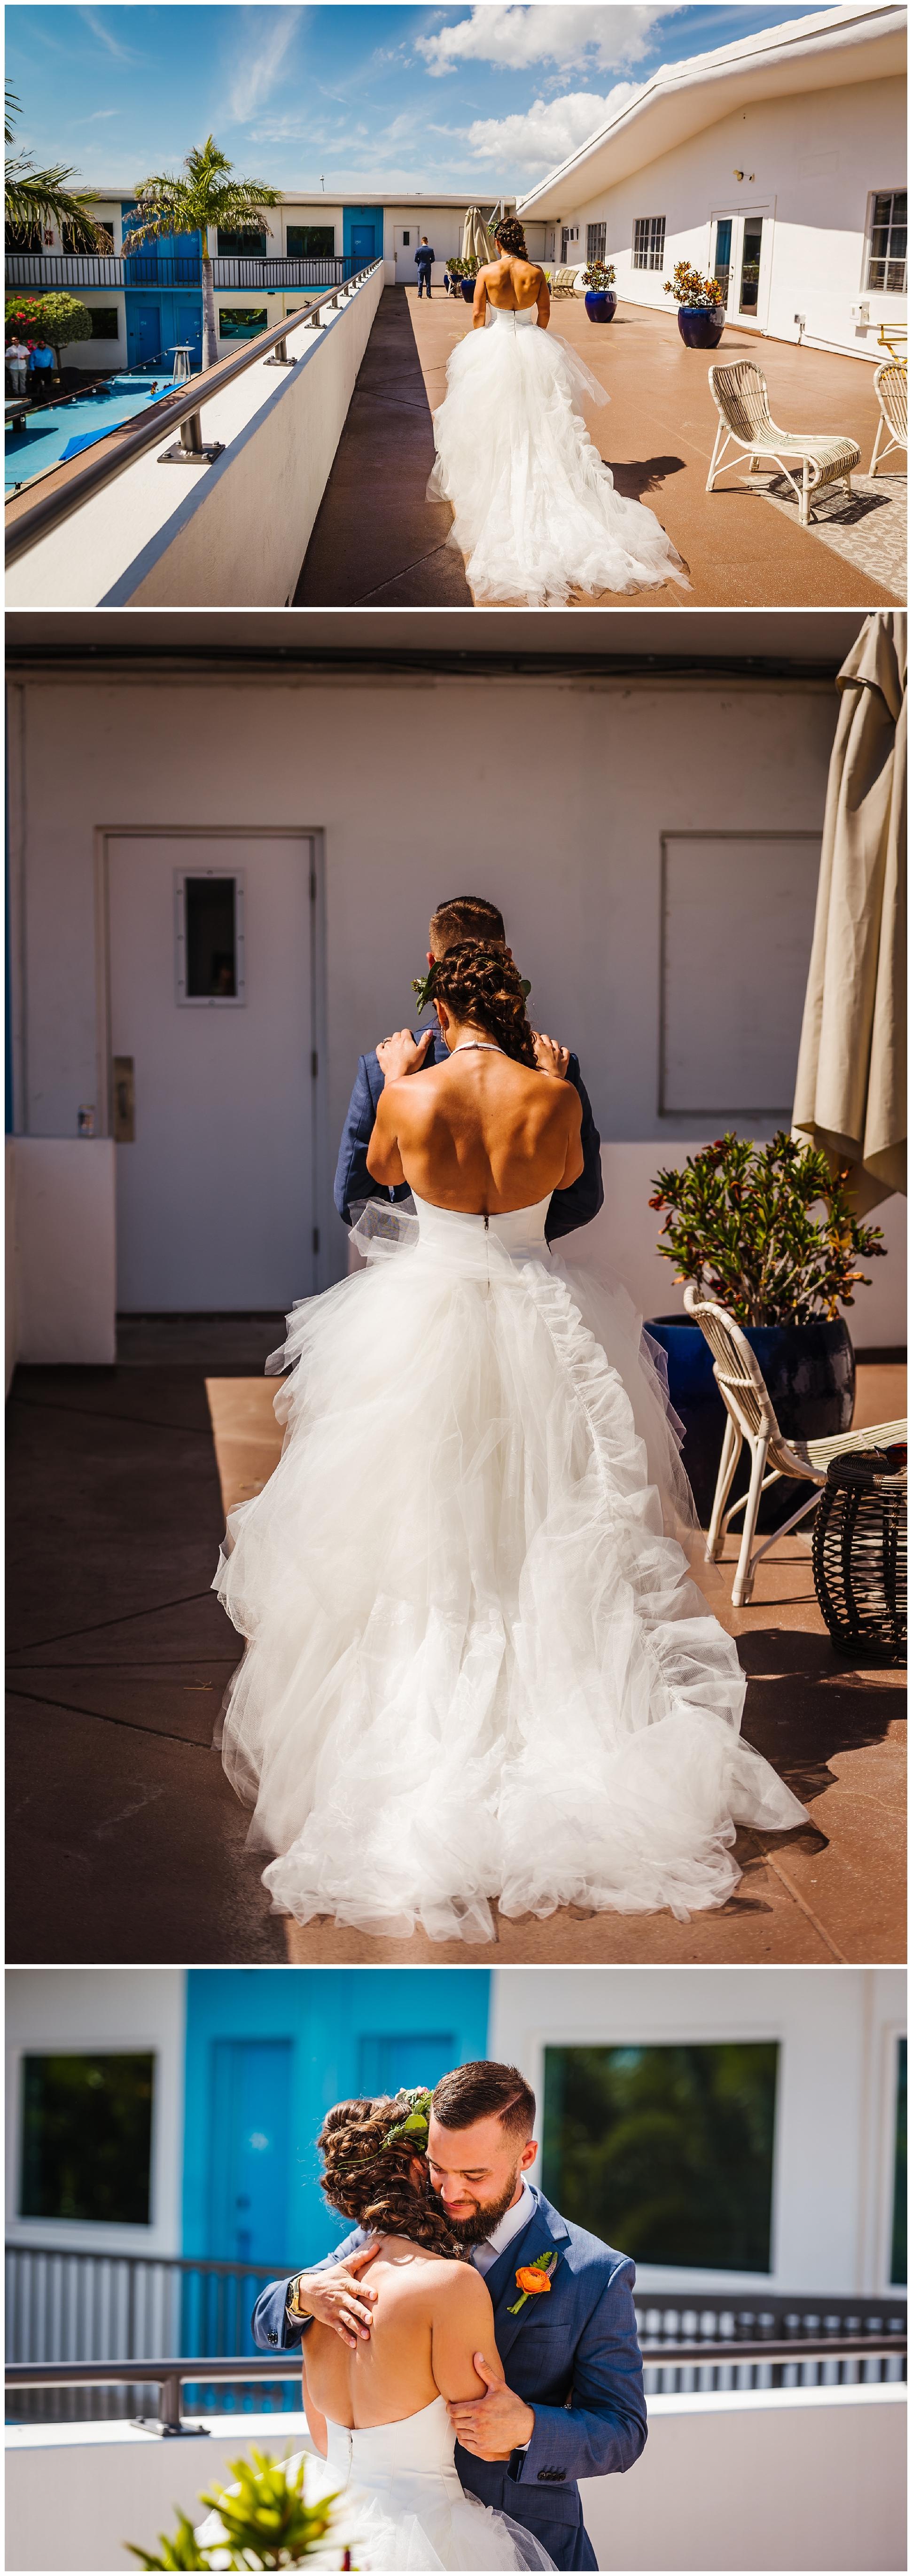 Tampa-wedding-photographer-vera-wang-flower-crown-post-card-inn_0013.jpg